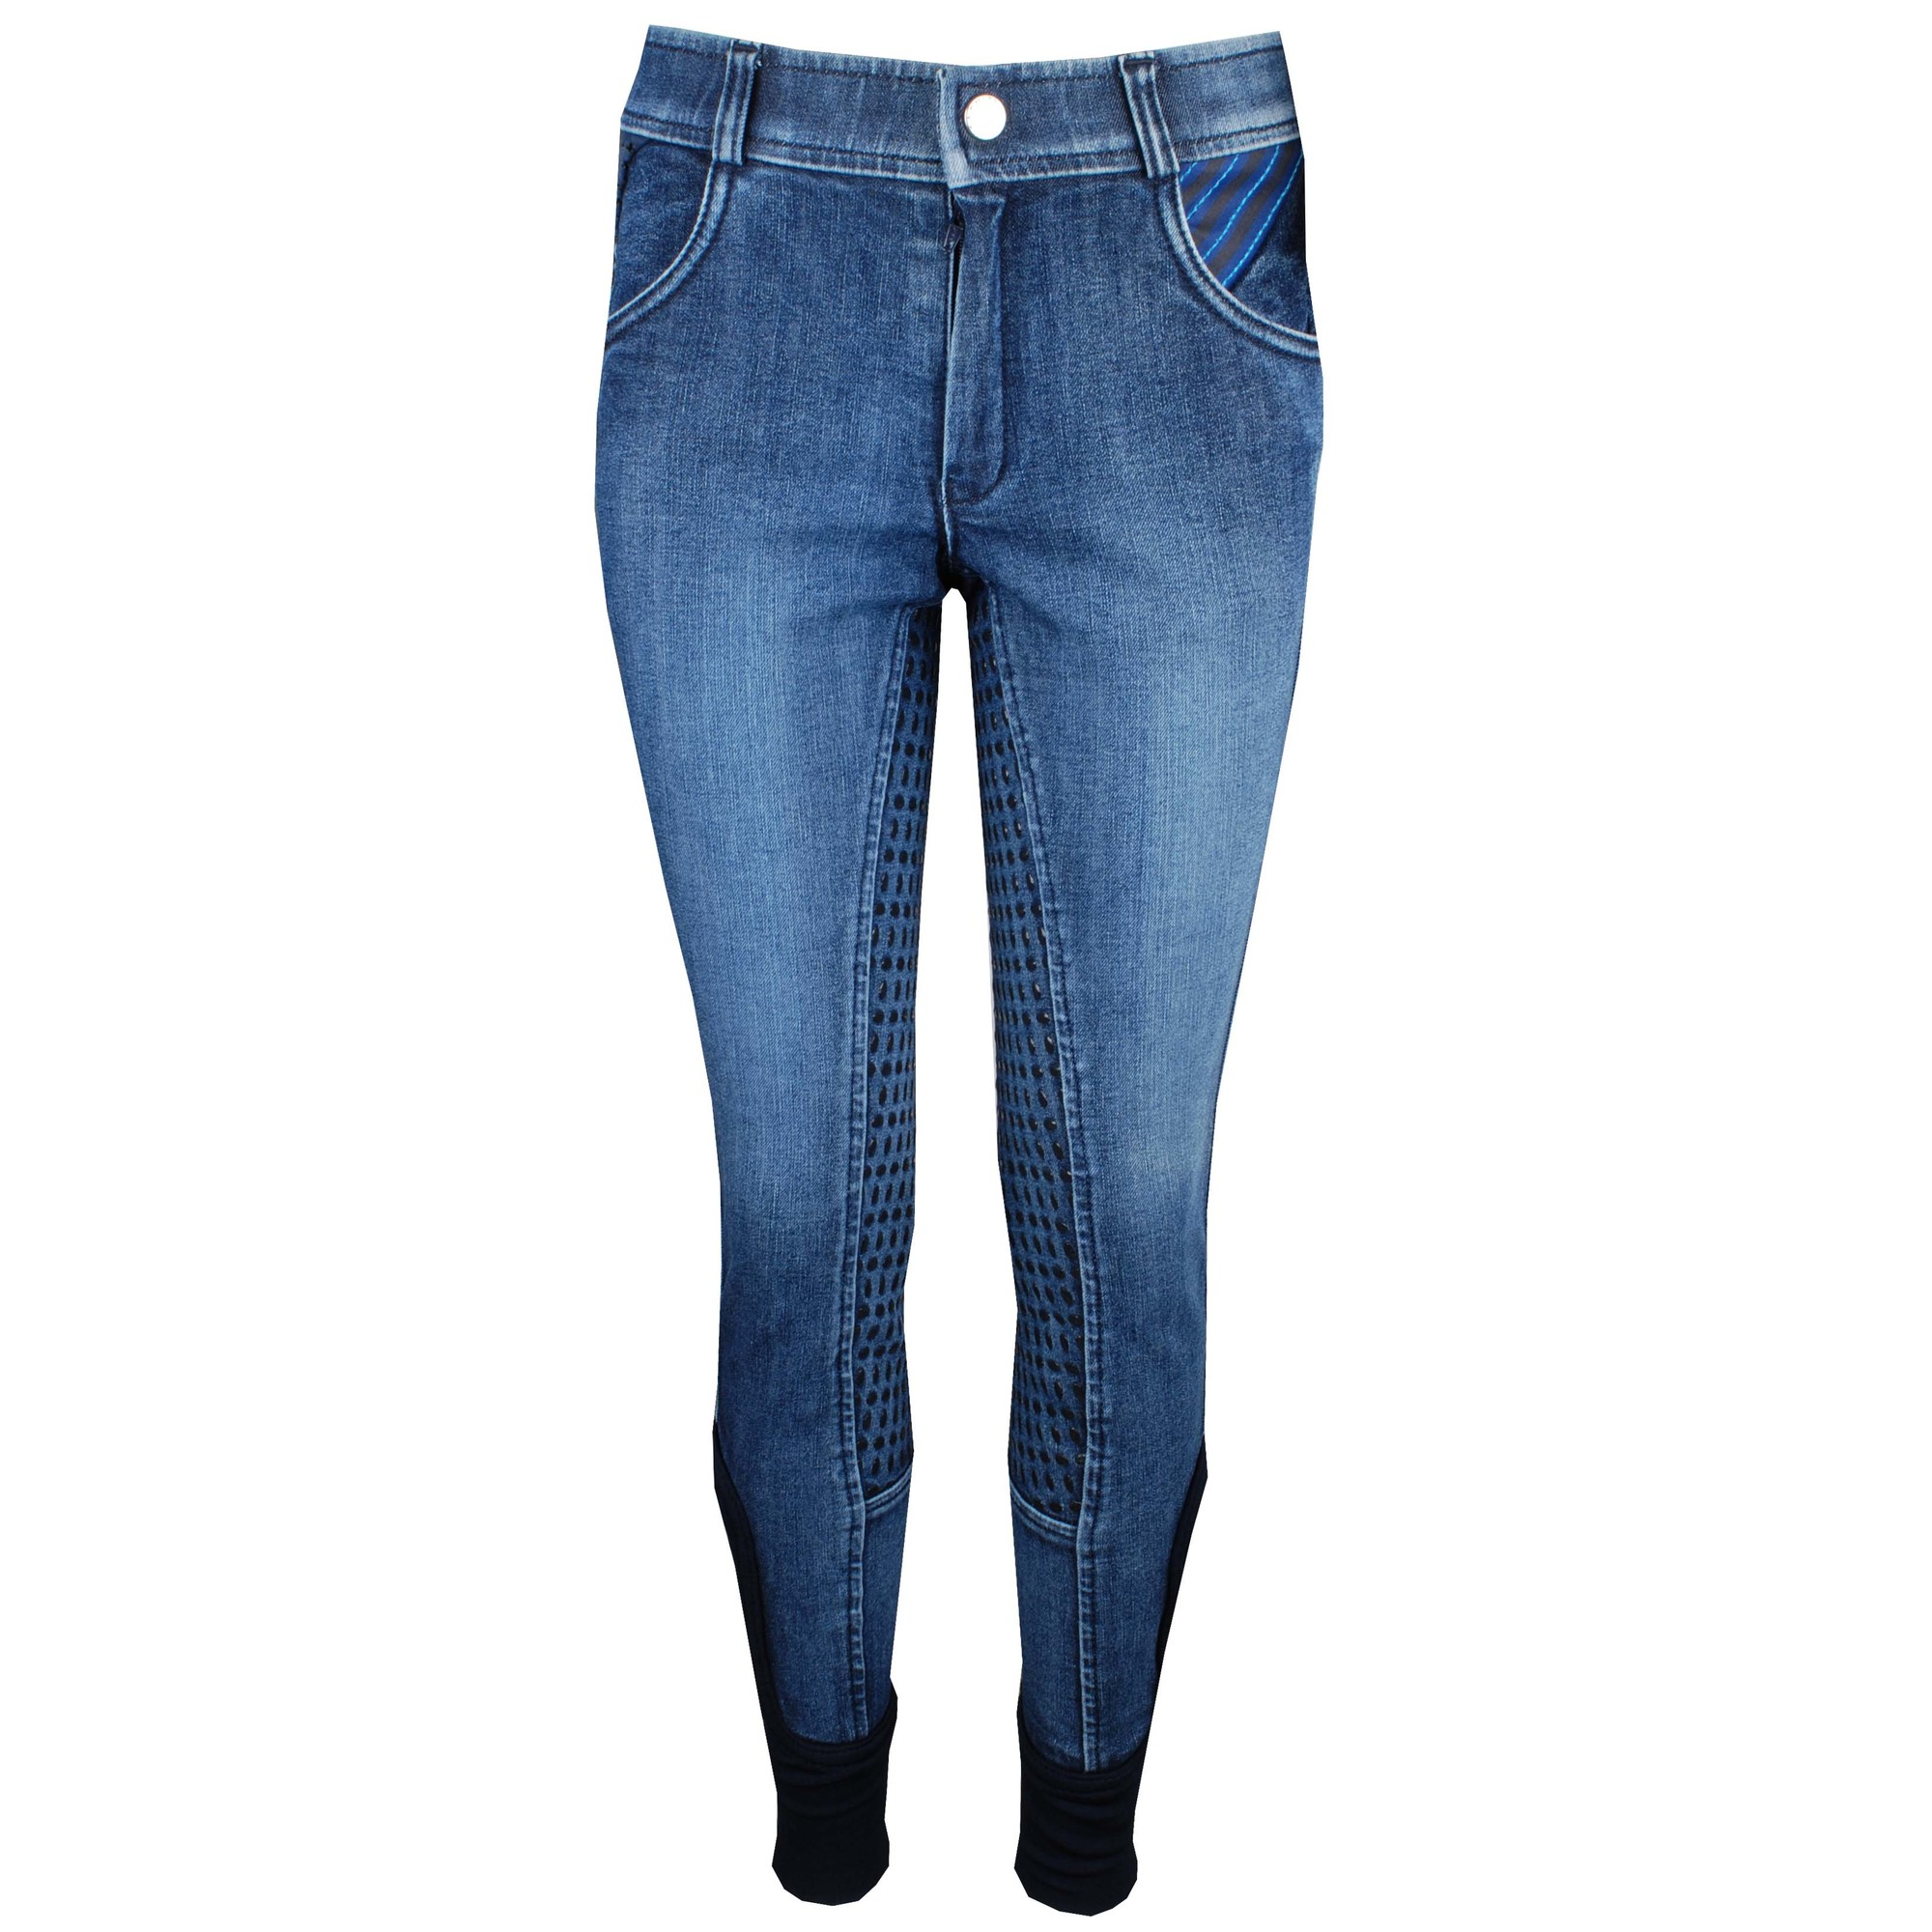 Harrys Horse Loulou Bowhill kinder rijbroek jeans maat:164